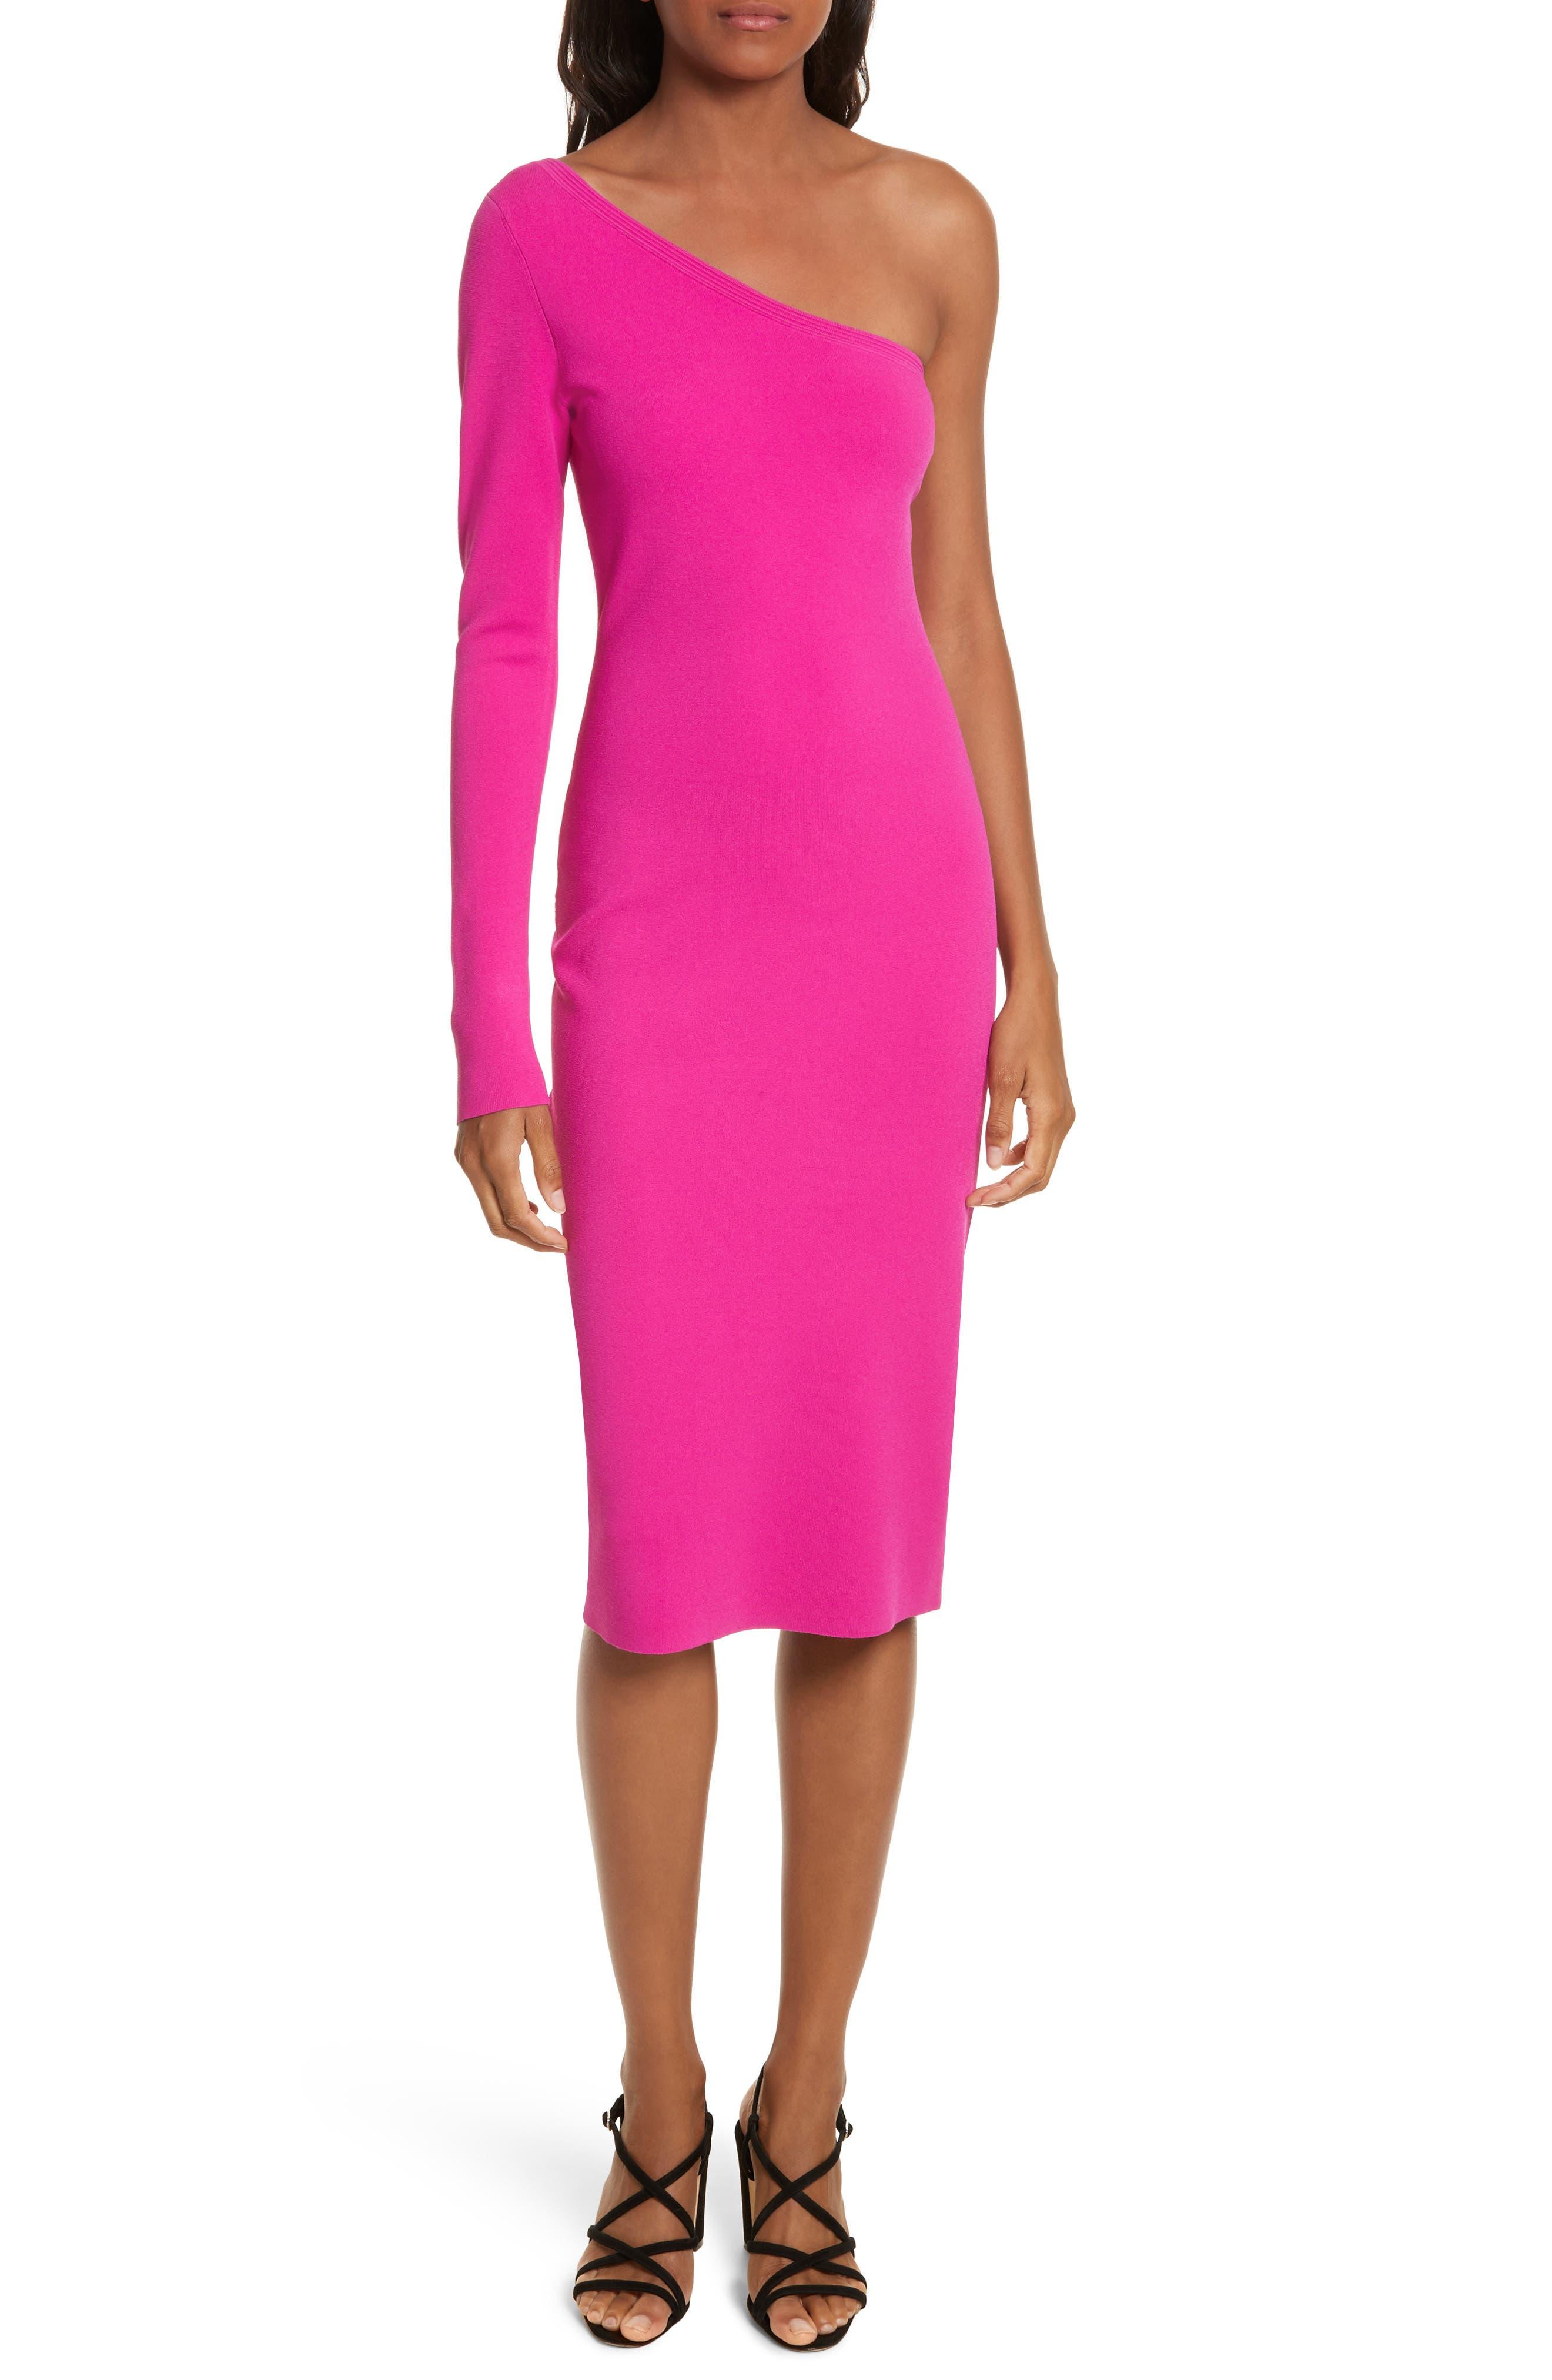 Diane von Furstenberg Knit One-Shoulder Midi Dress,                             Main thumbnail 1, color,                             Ribbon Pink